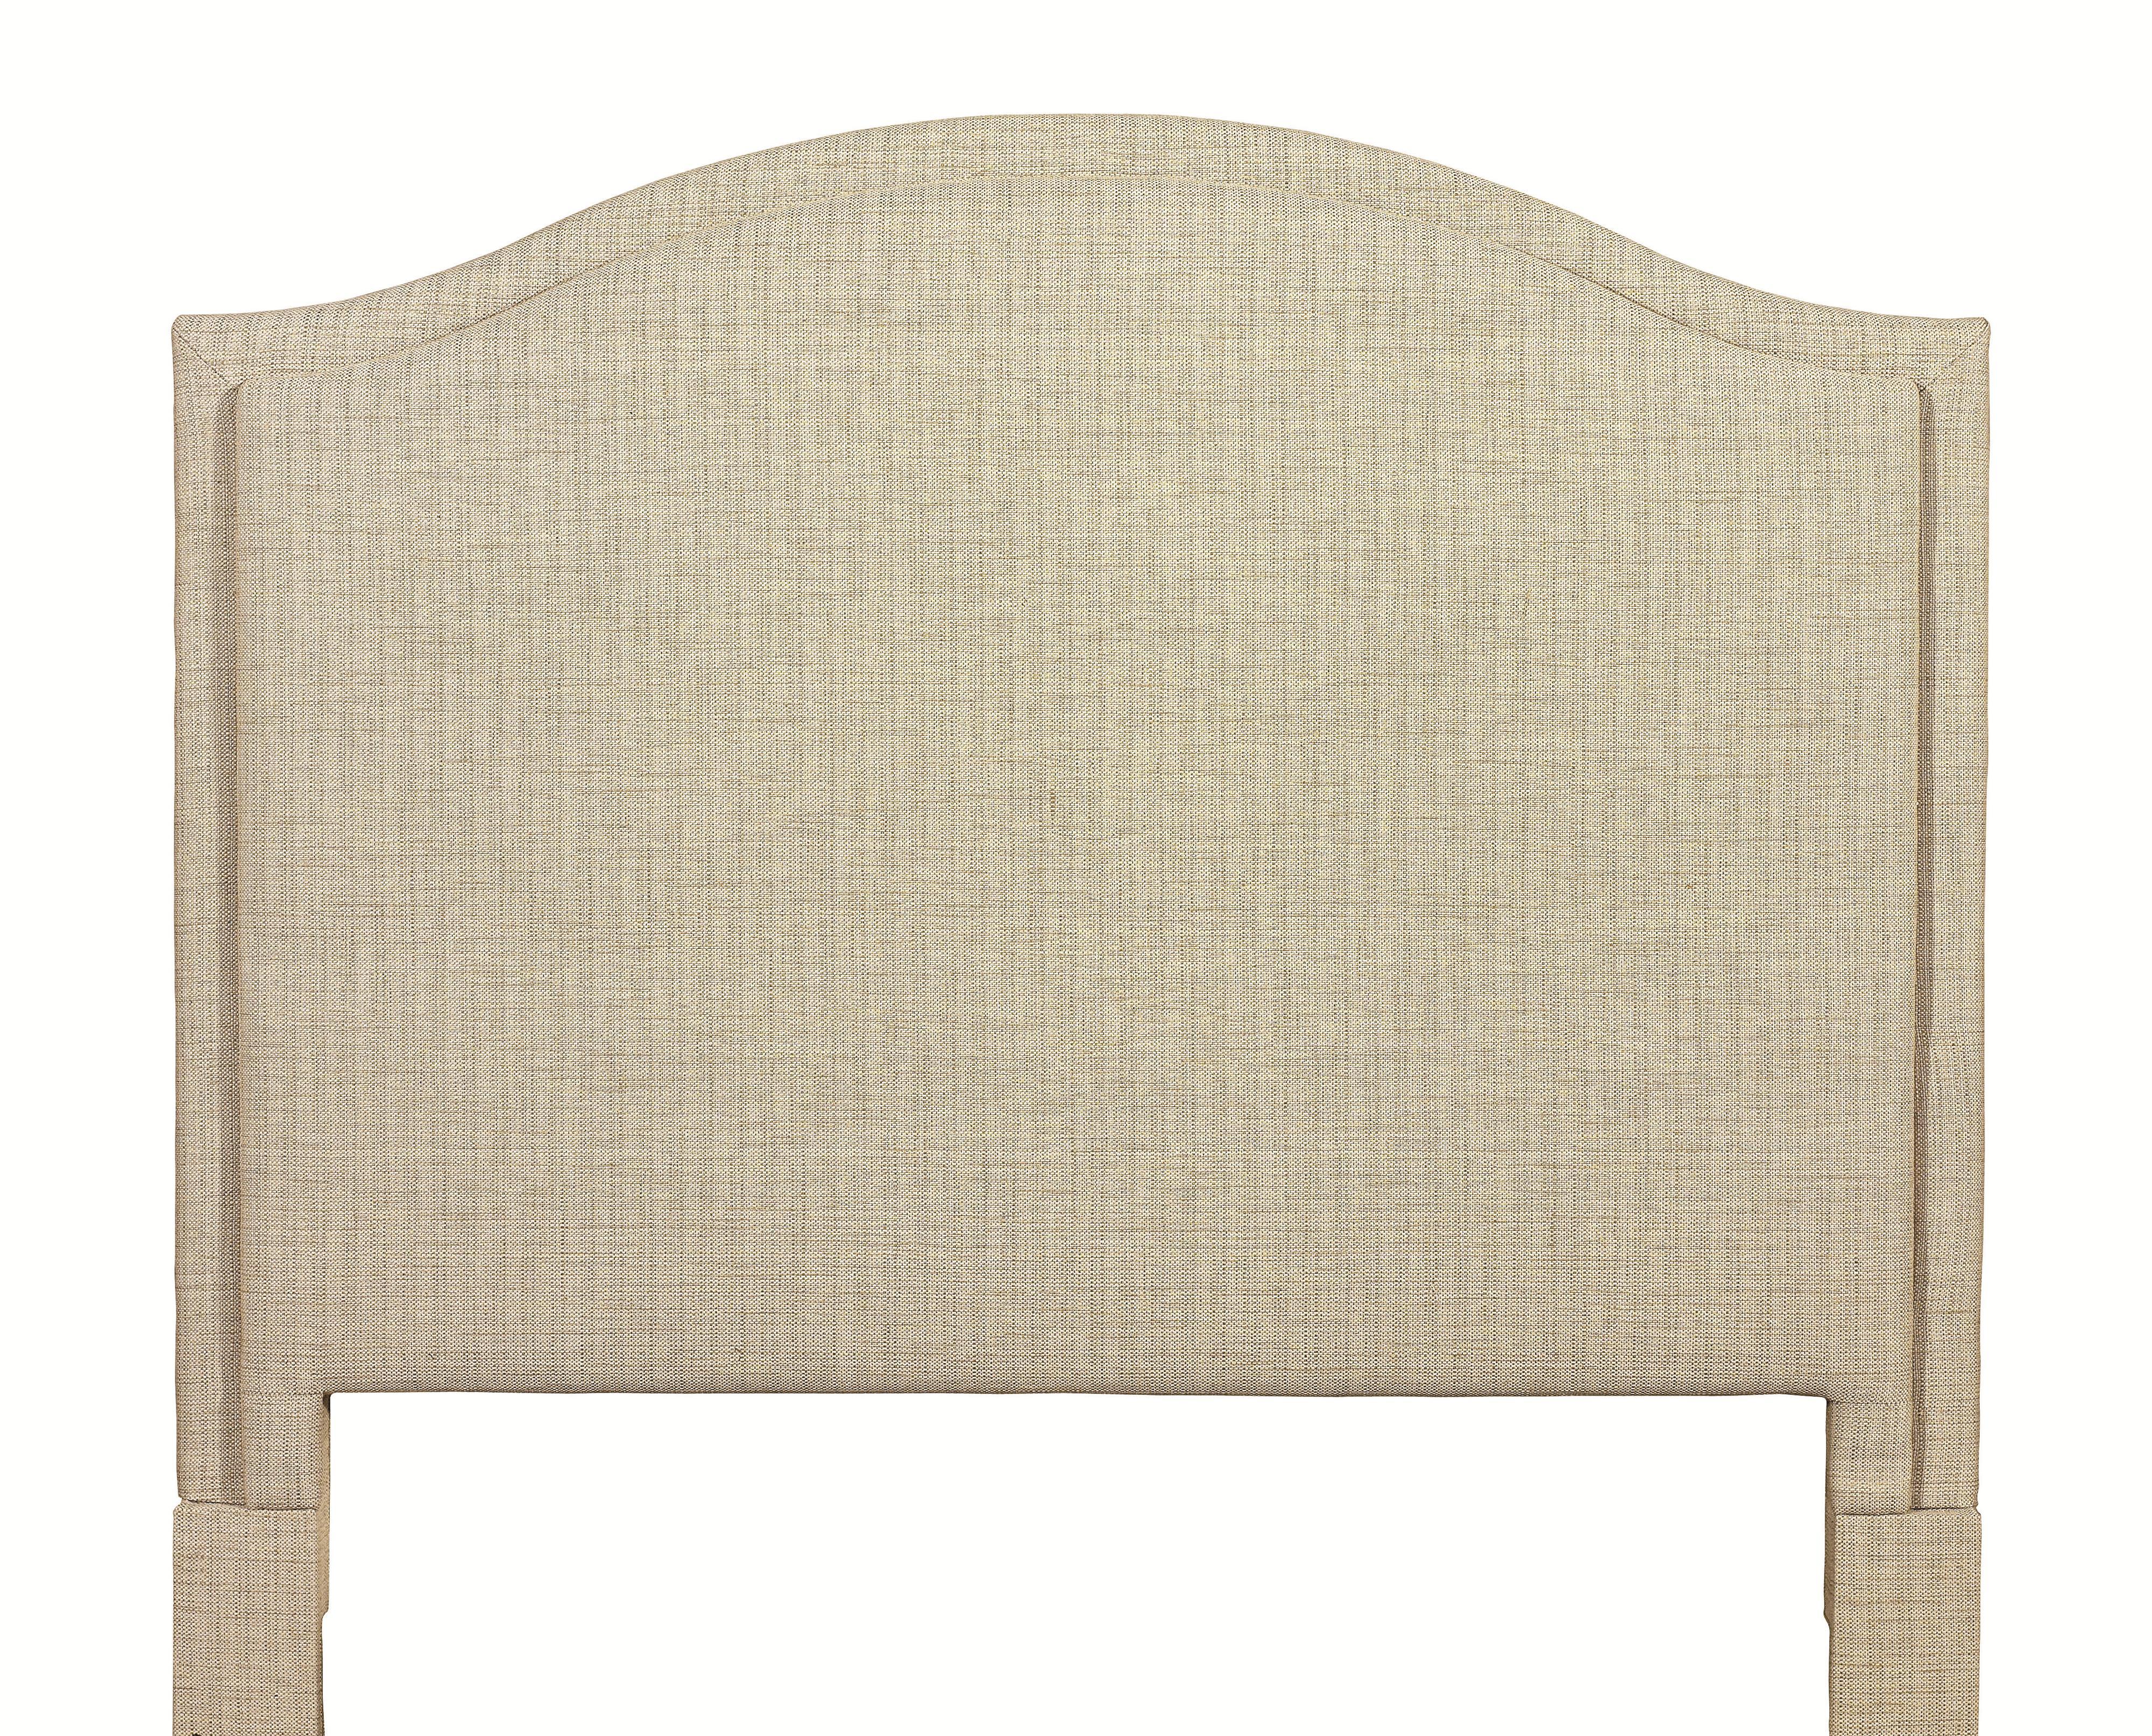 Custom Upholstered Beds Queen Vienna Upholstered Headboard by Bassett at Bassett of Cool Springs